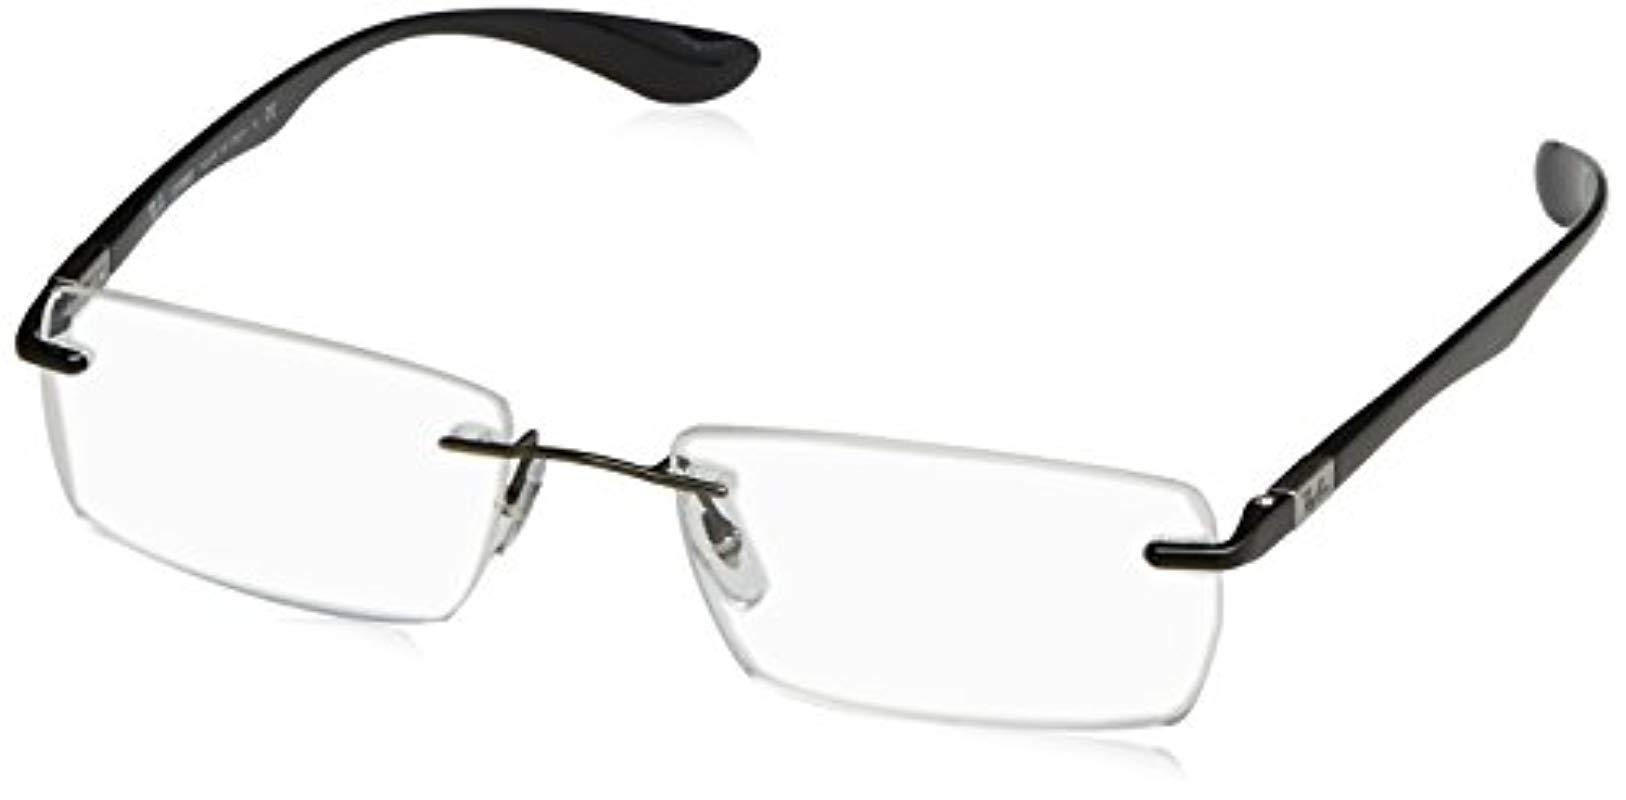 ff845d939b8 Ray-Ban 0rx 8724 1000 54 Optical Frames